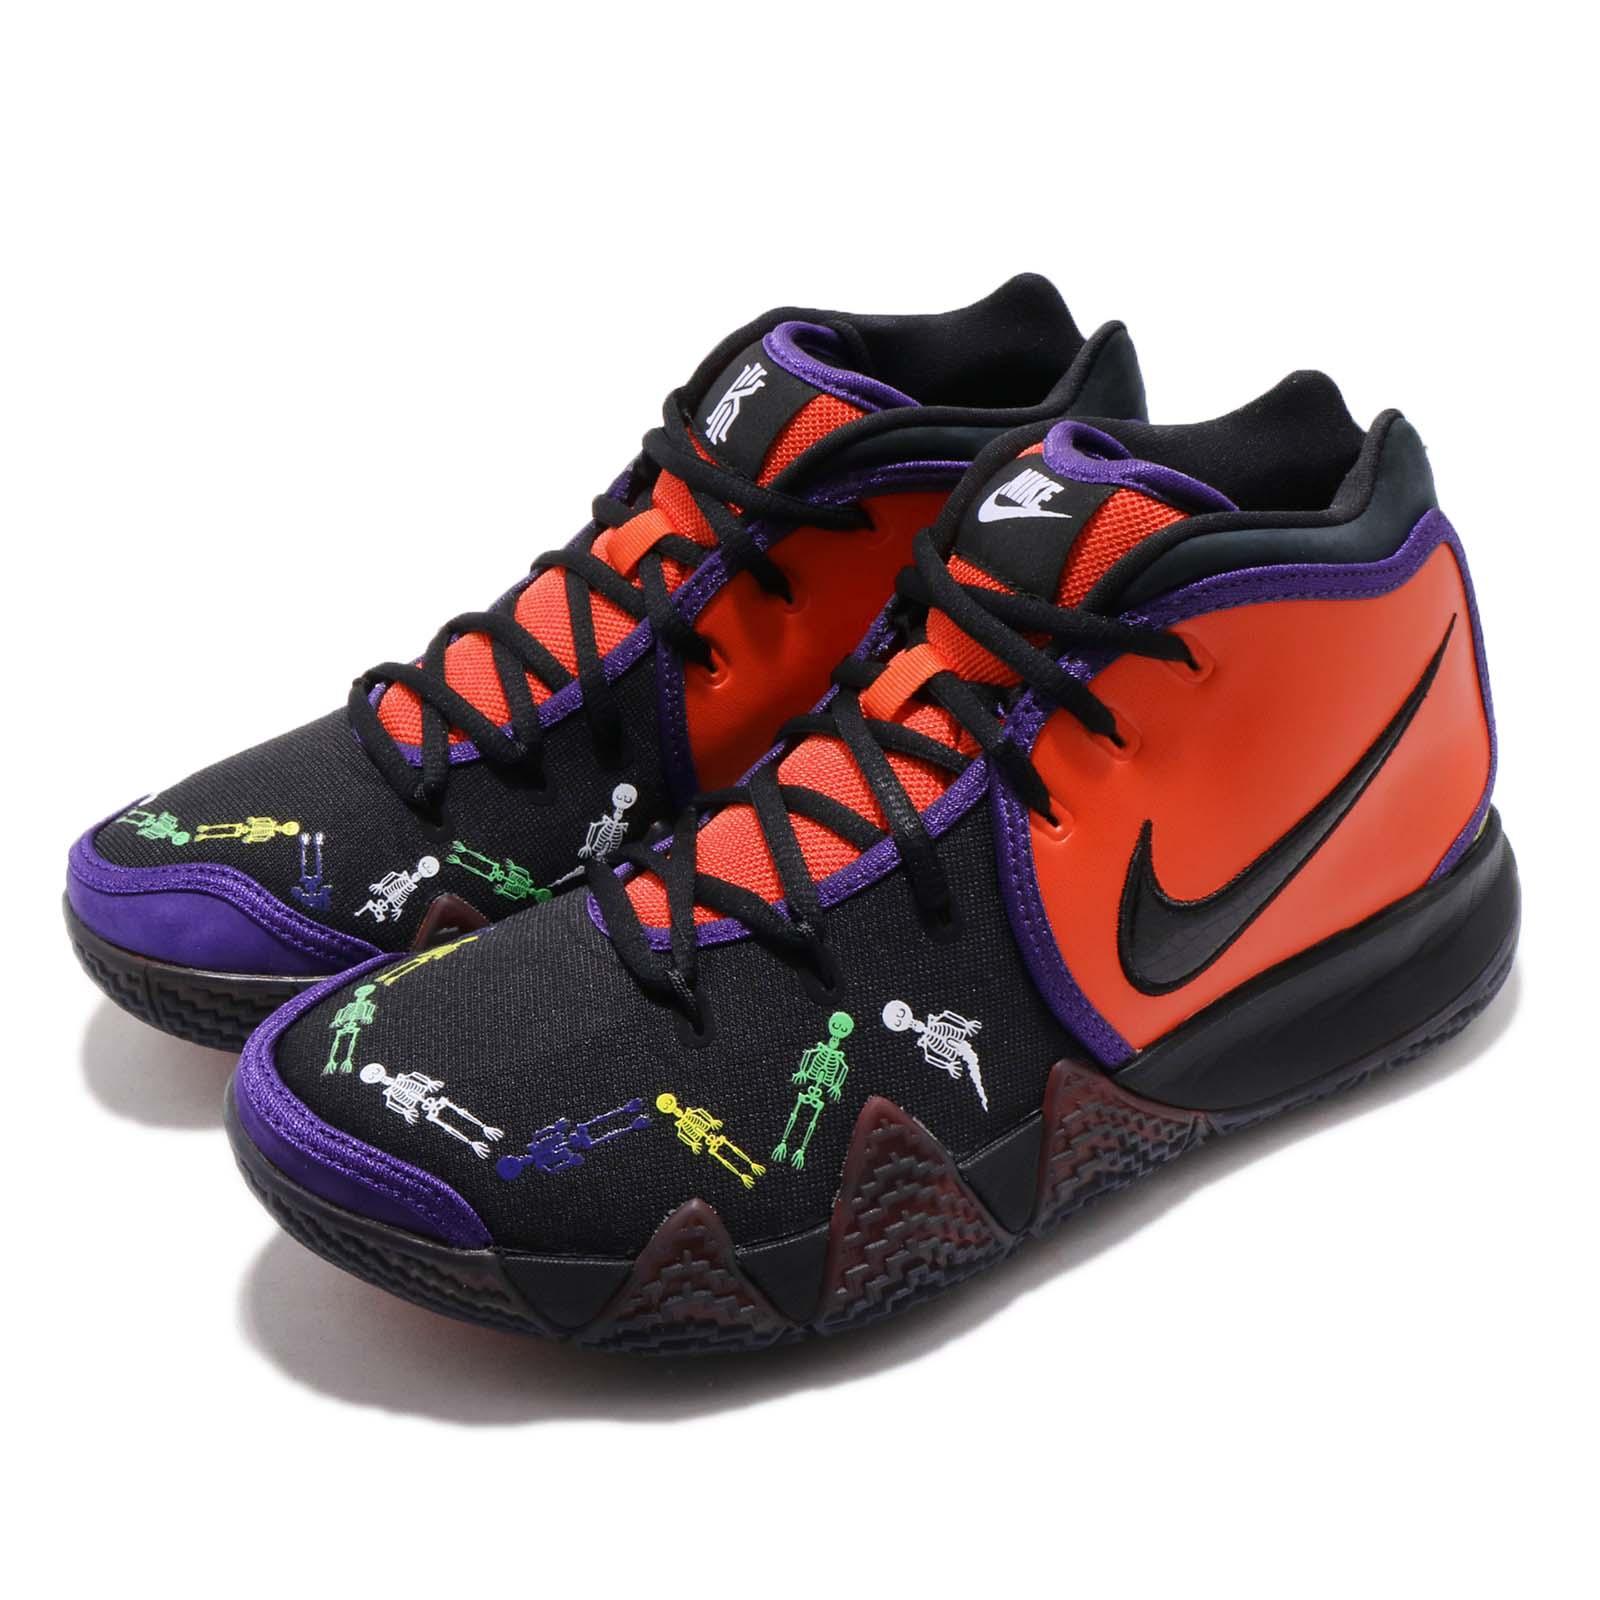 Nike 籃球鞋 Kyrie 4 明星款 男鞋 CI0278-800